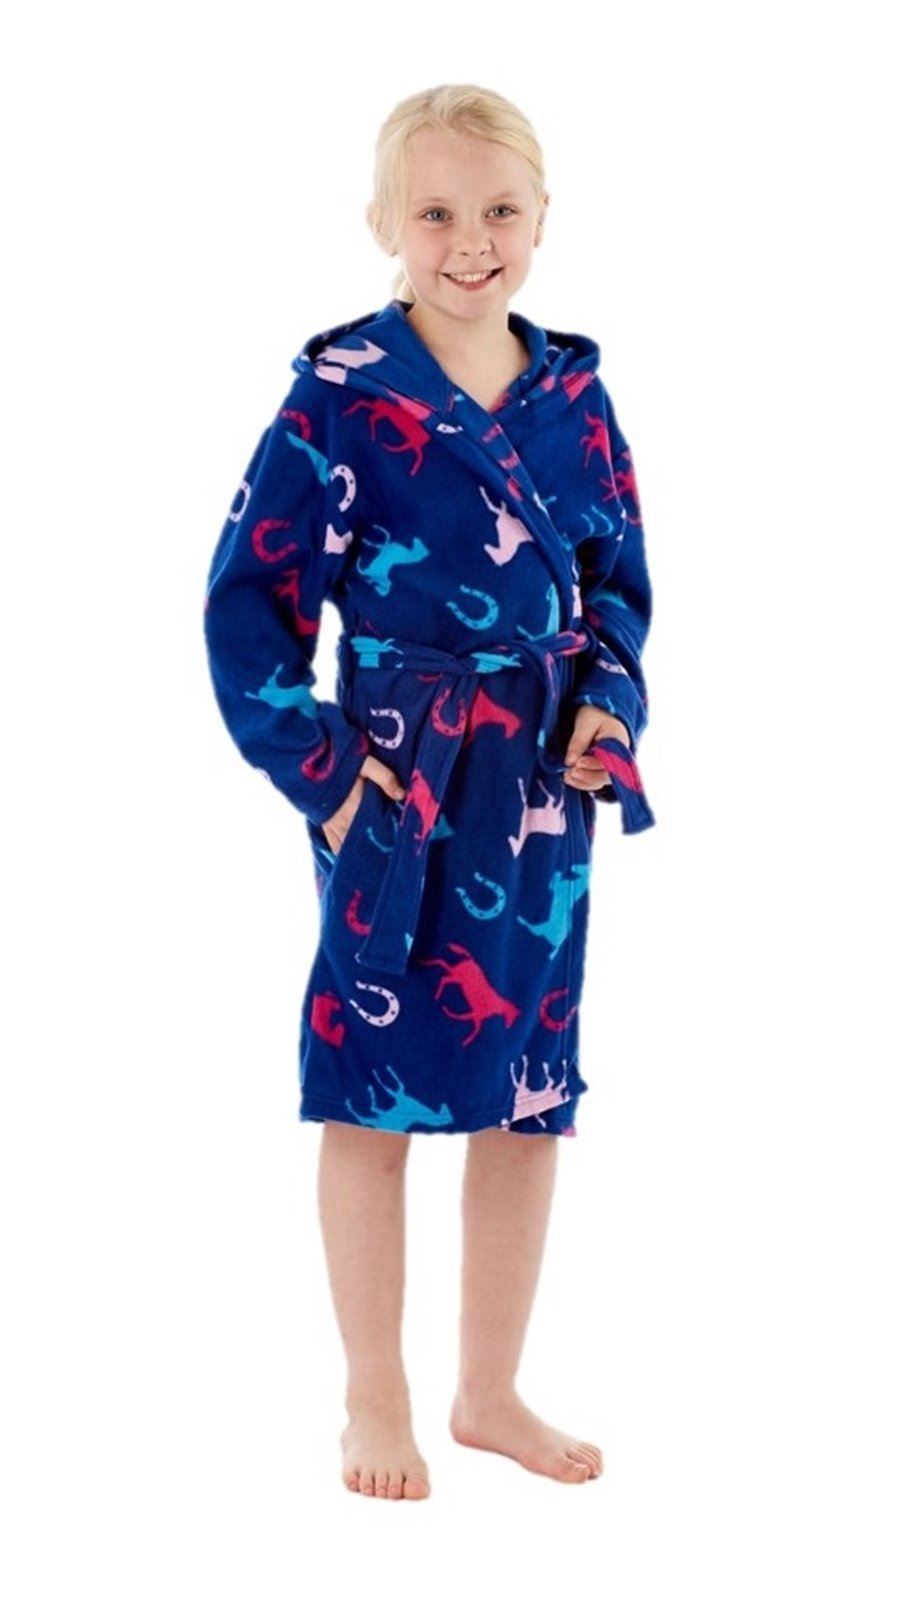 filles cheval peignoir polaire robe de chambre ge 7 8 9. Black Bedroom Furniture Sets. Home Design Ideas